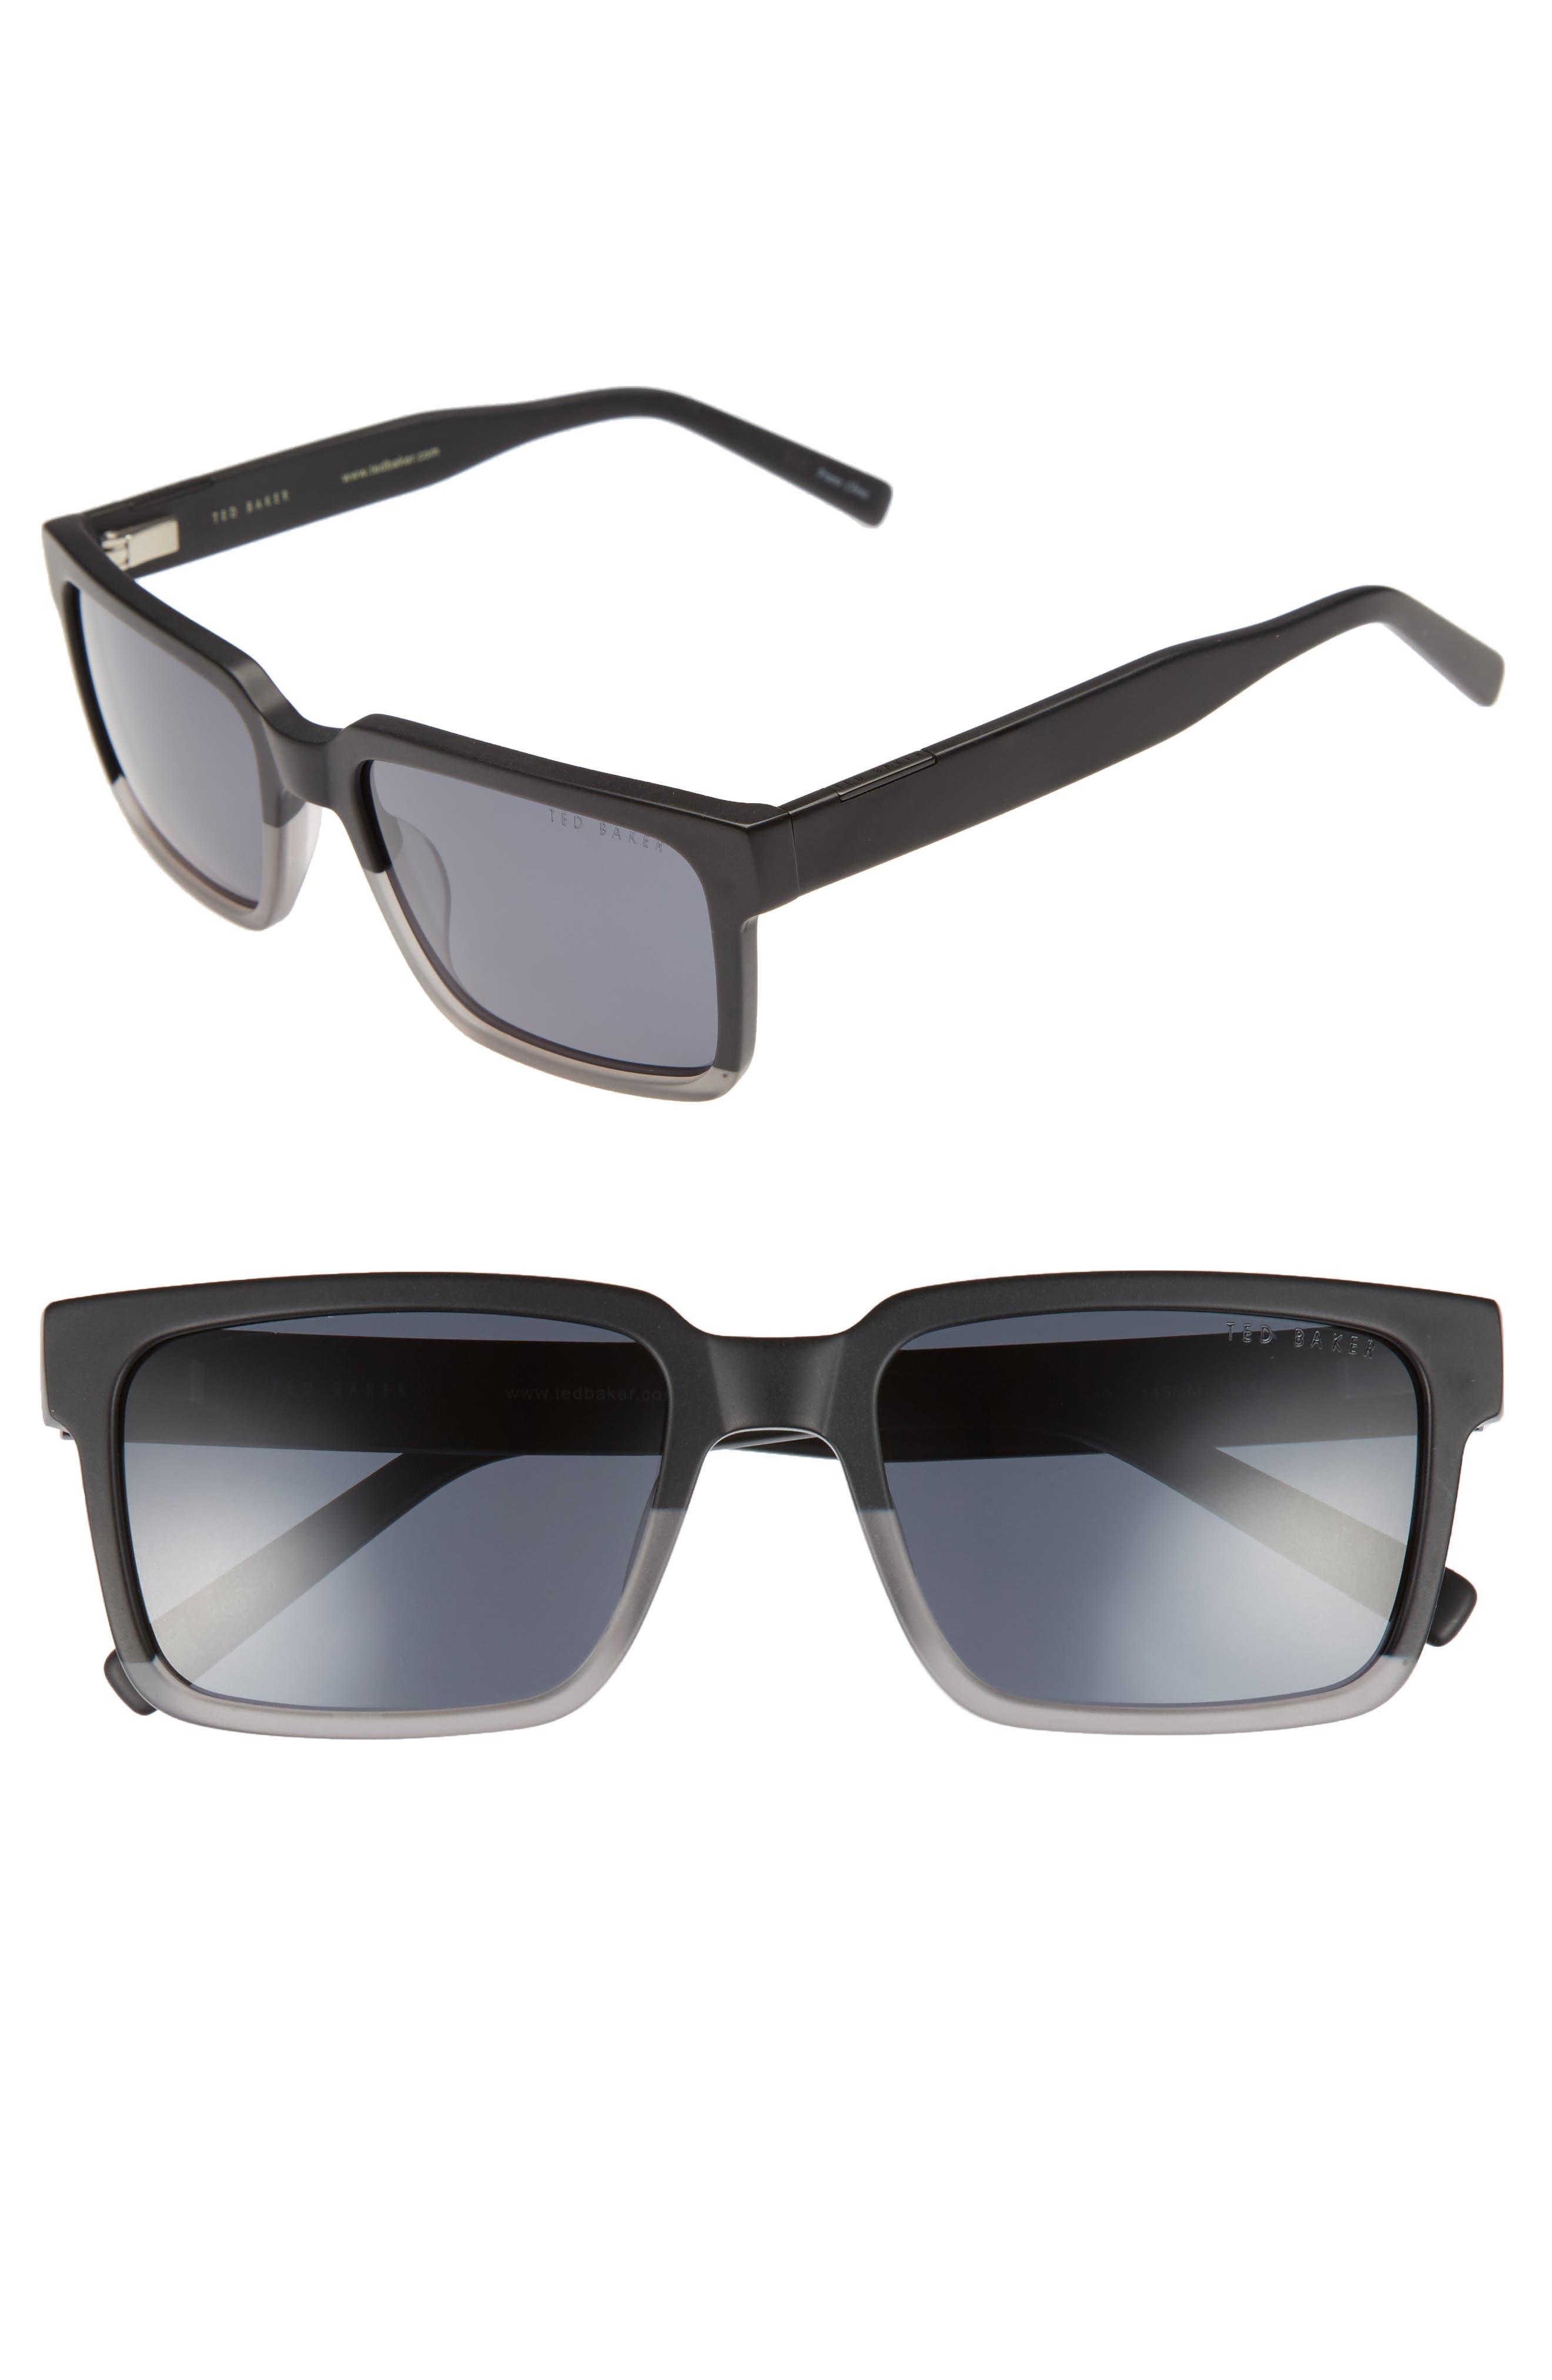 56mm Polarized Rectangular Sunglasses,                             Main thumbnail 1, color,                             001